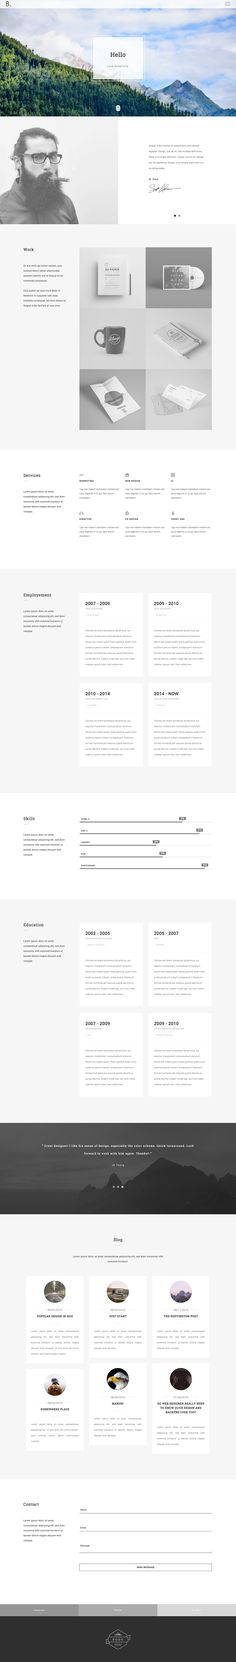 Bodo – is a Professional Responsive Personal and Portfolio Resume Template… Best Portfolio Websites, Site Portfolio, Portfolio Resume, Portfolio Design, Minimal Web Design, Web Ui Design, Resume Design, Graphic Design, Self Branding